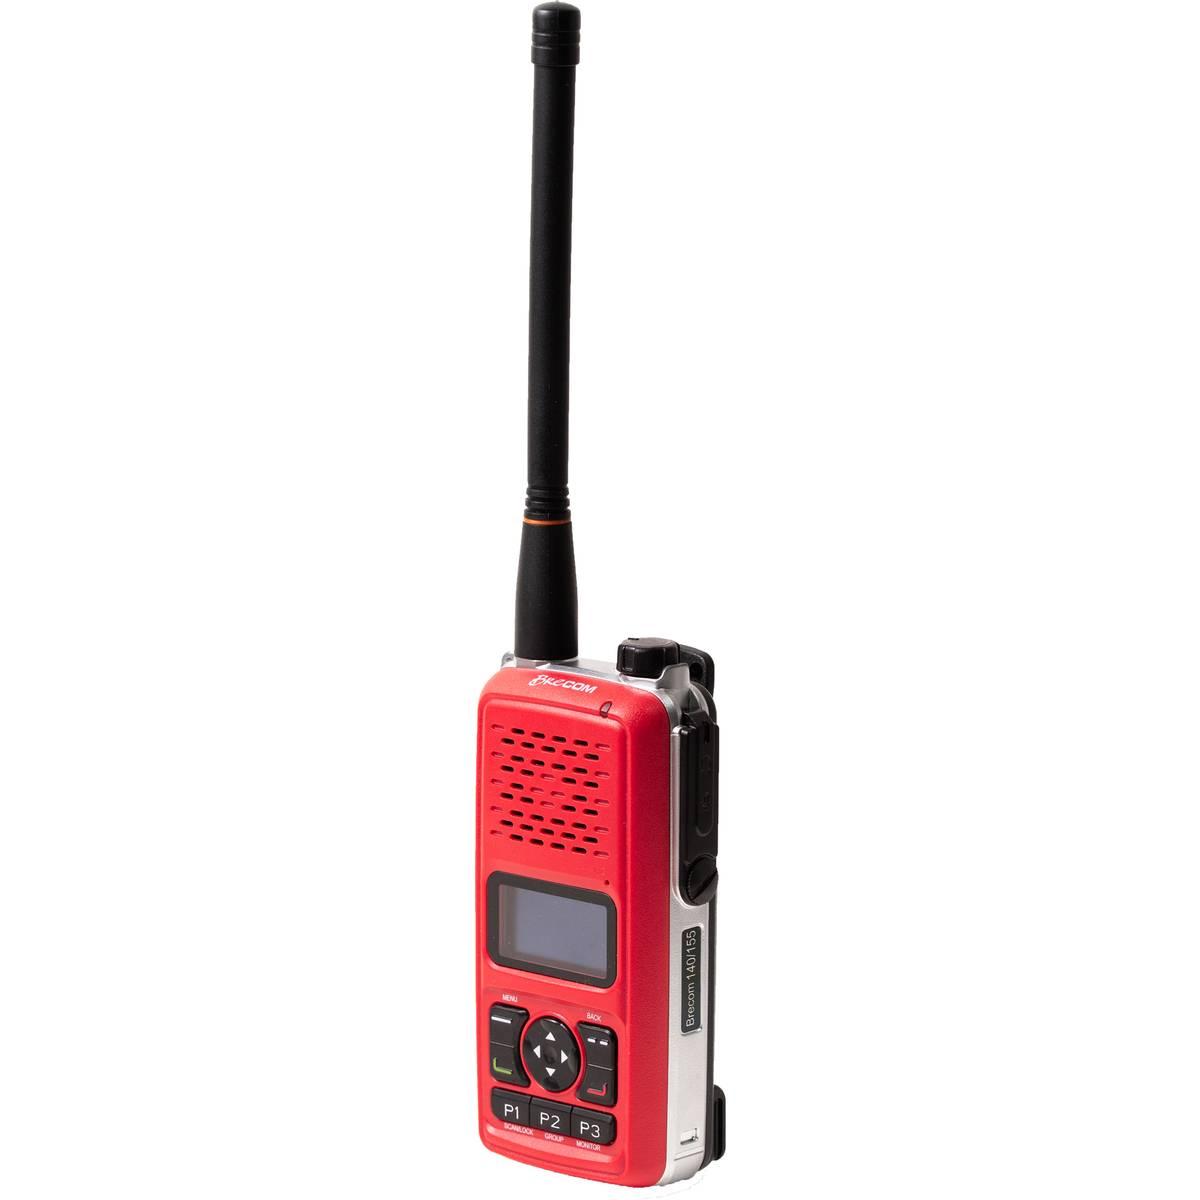 Brecom VR-3500 analog/digital radio DMR 138-174Mhz